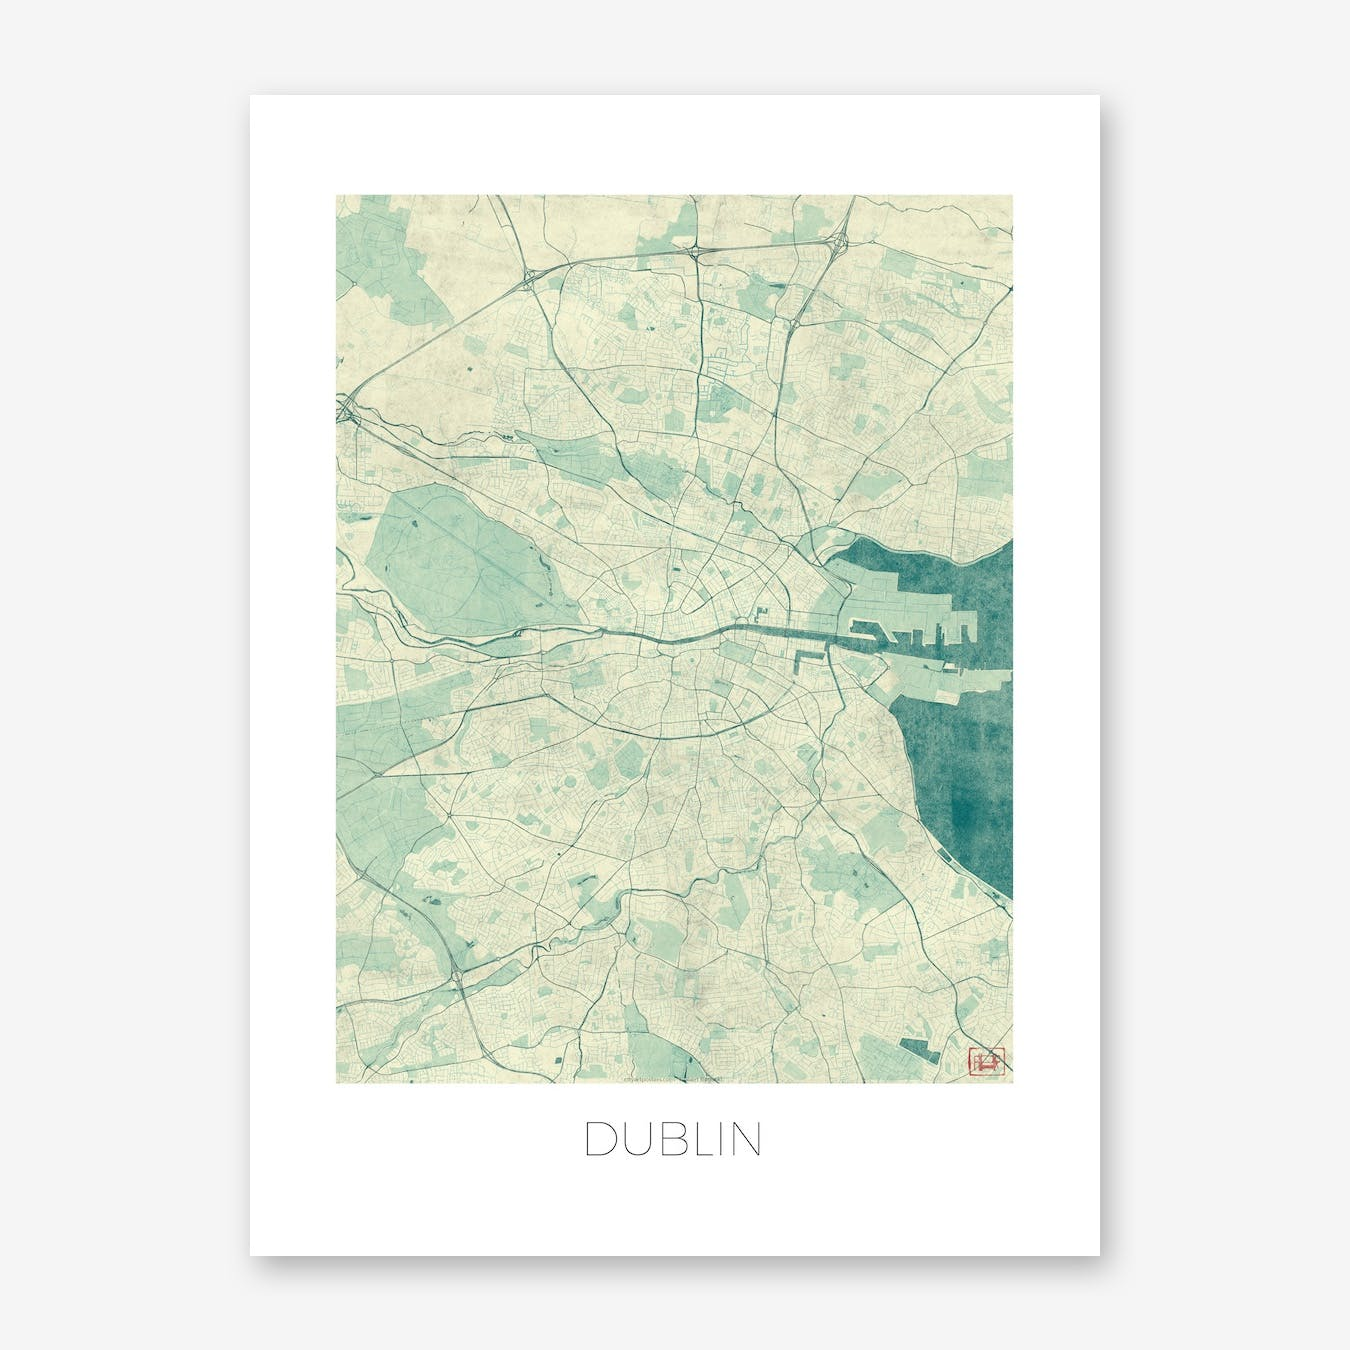 Dublin Map Vintage in Blue